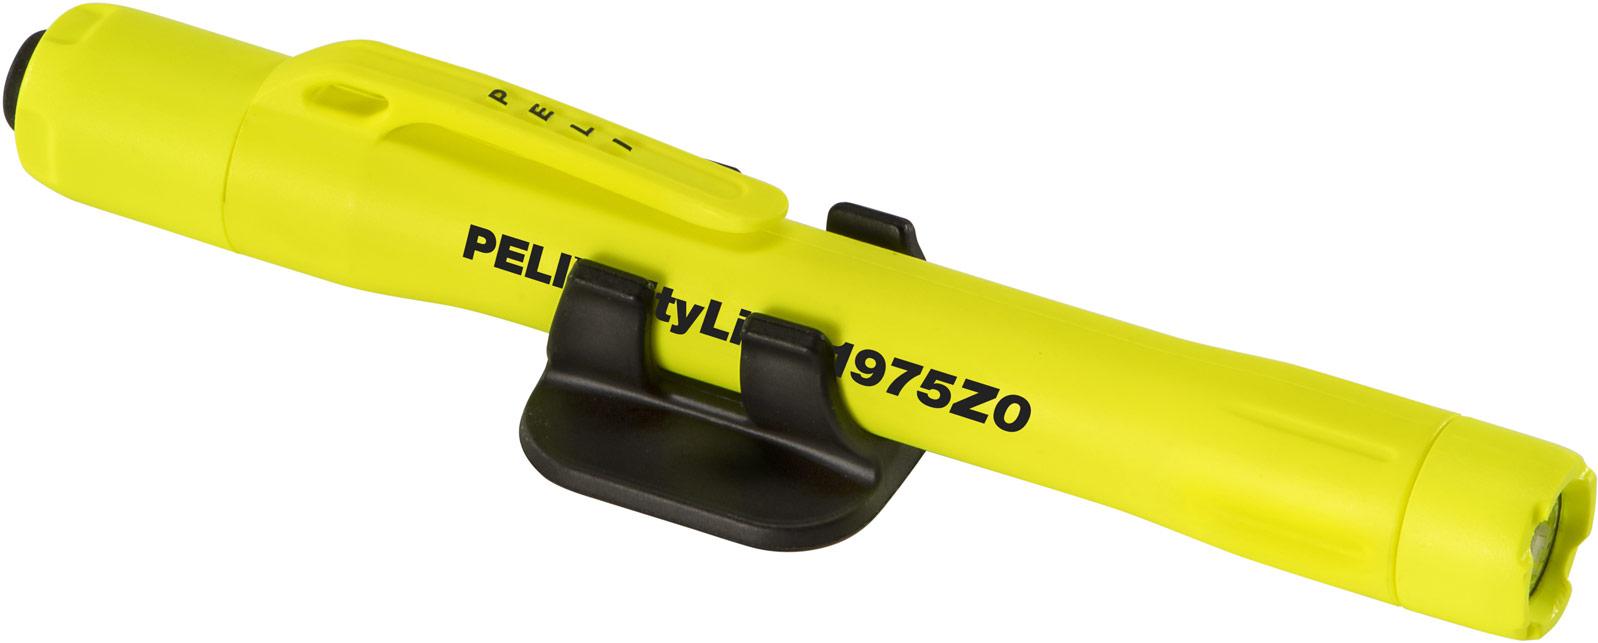 peli mitylite 1975z0 clipflashlight